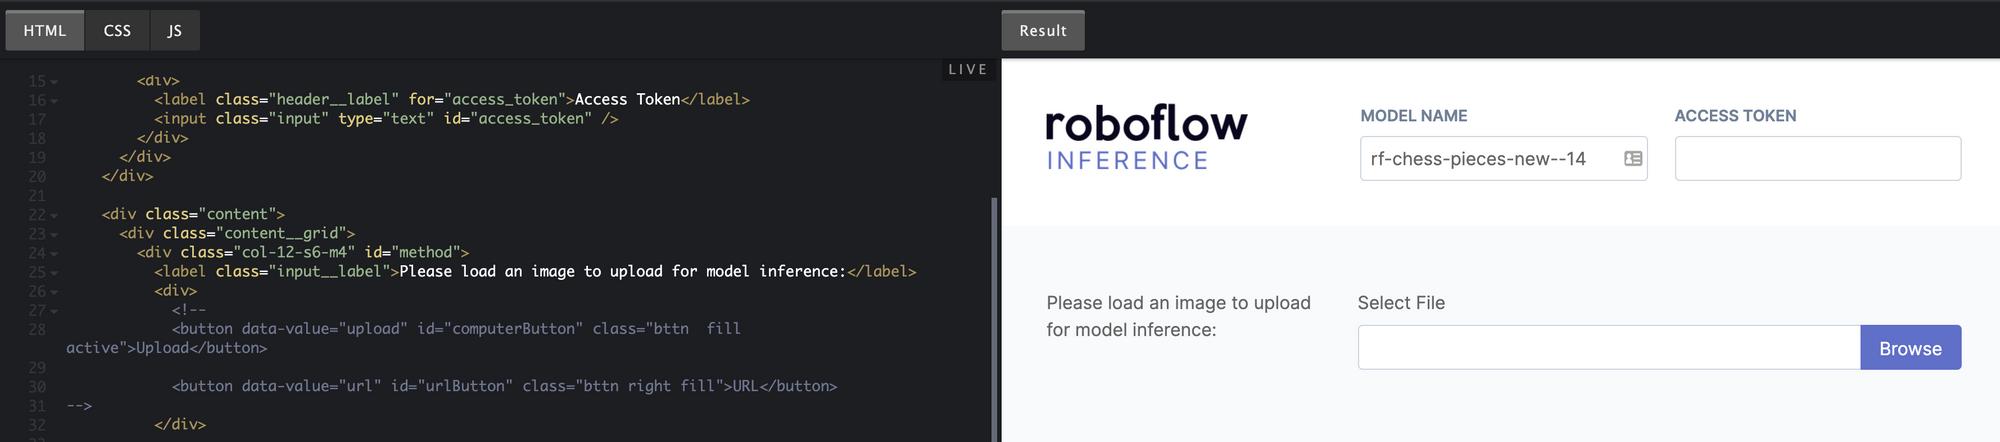 Customizing the Roboflow Infer Example Web App